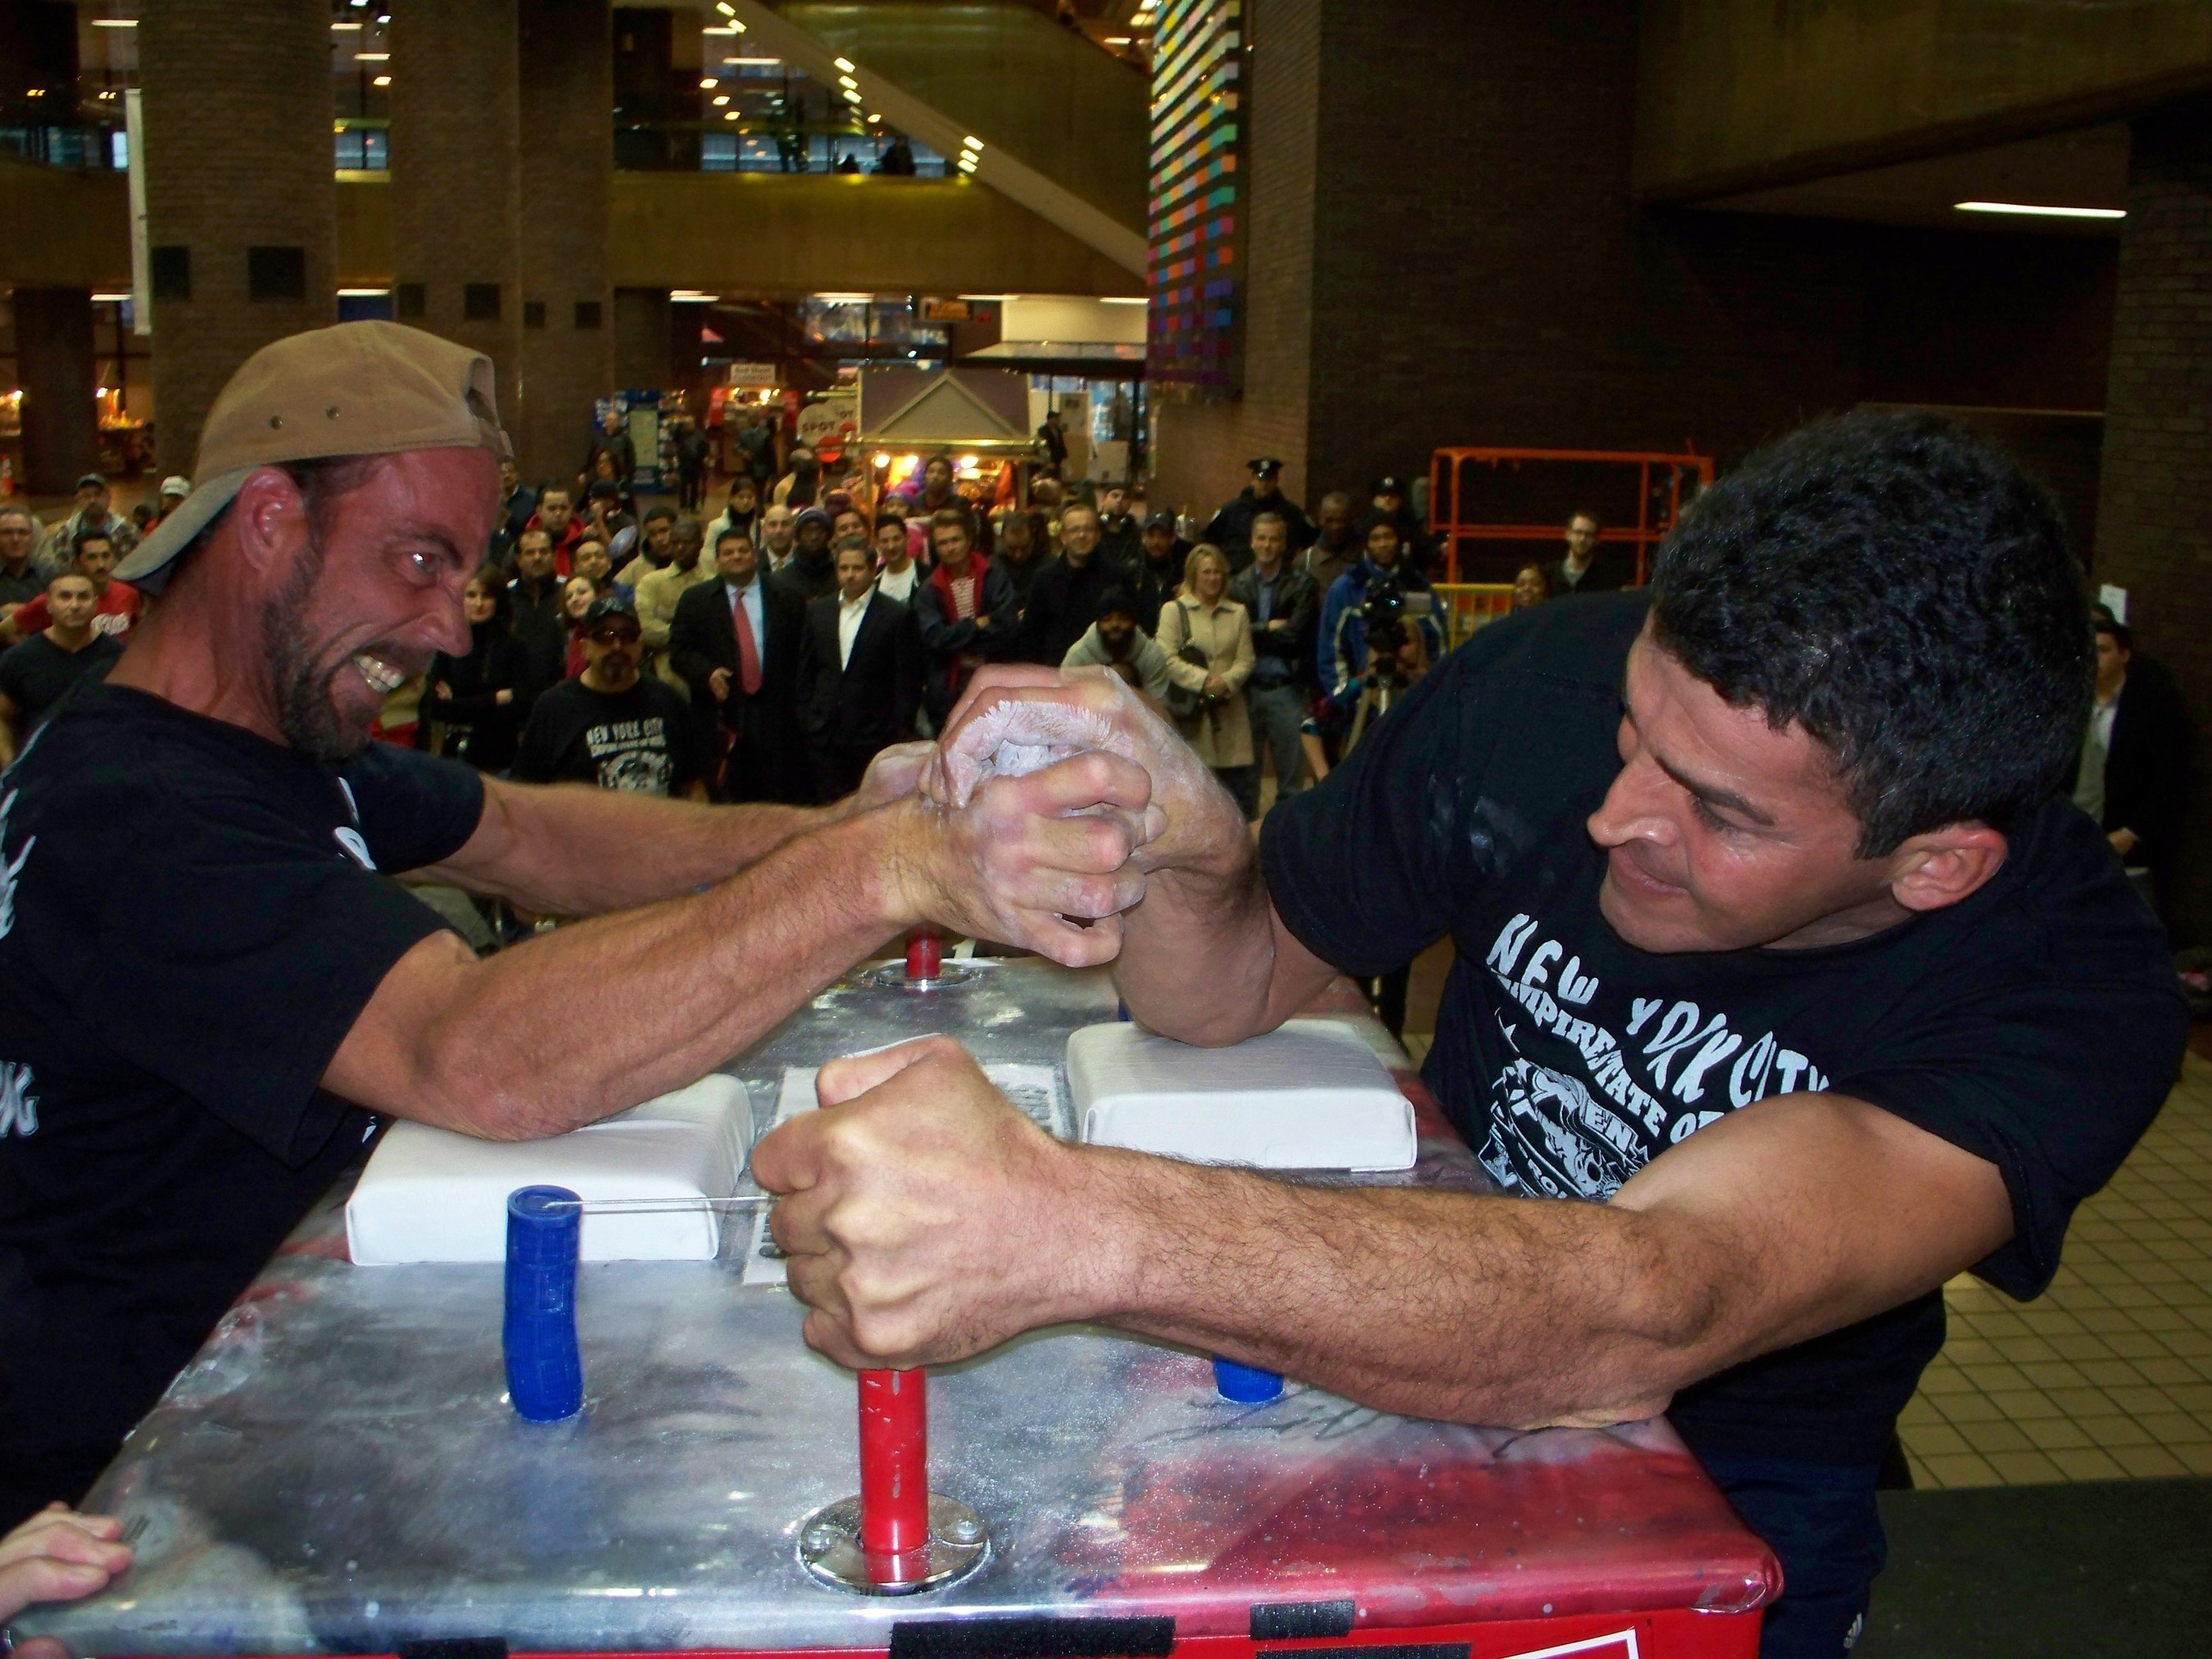 New York Arm Wrestling Association Presents 38th New York State Arm Wrestling Championships Nov. 22